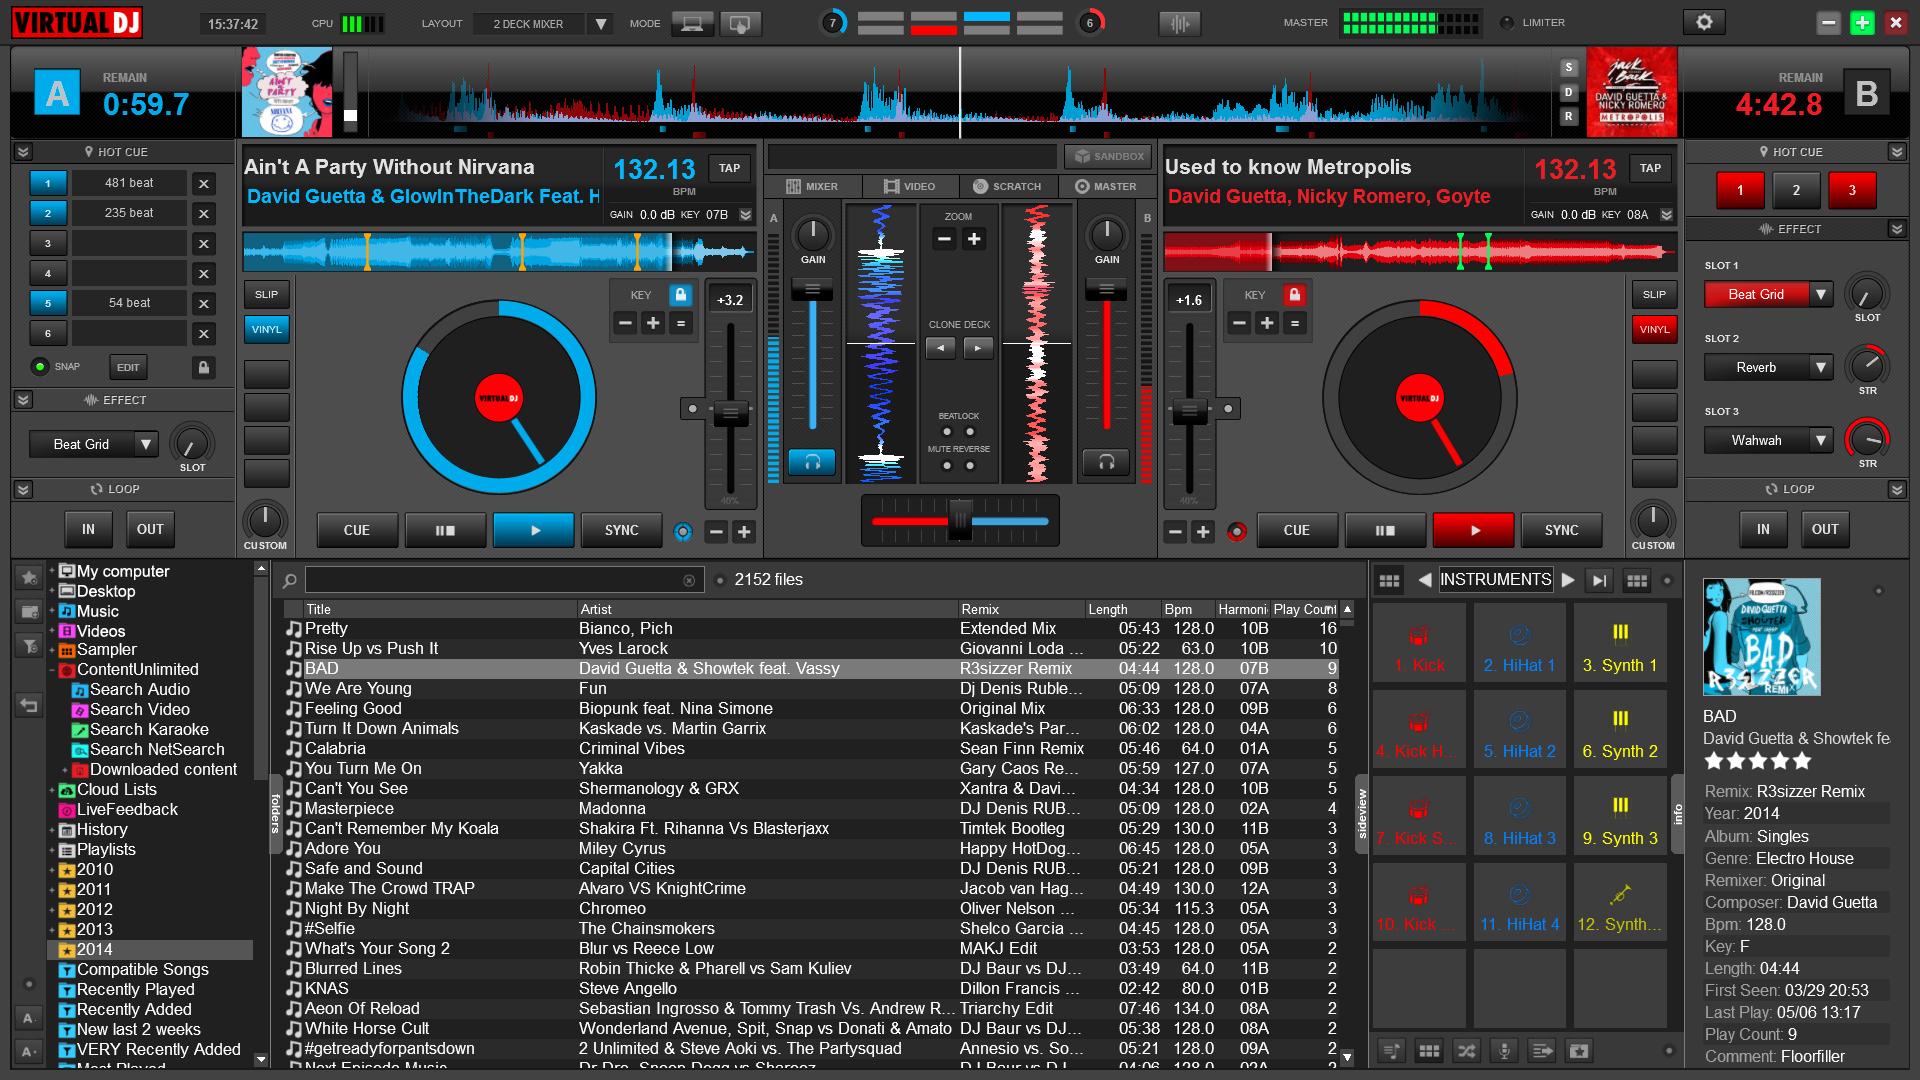 Virtual DJ Home Free Download – GIGA